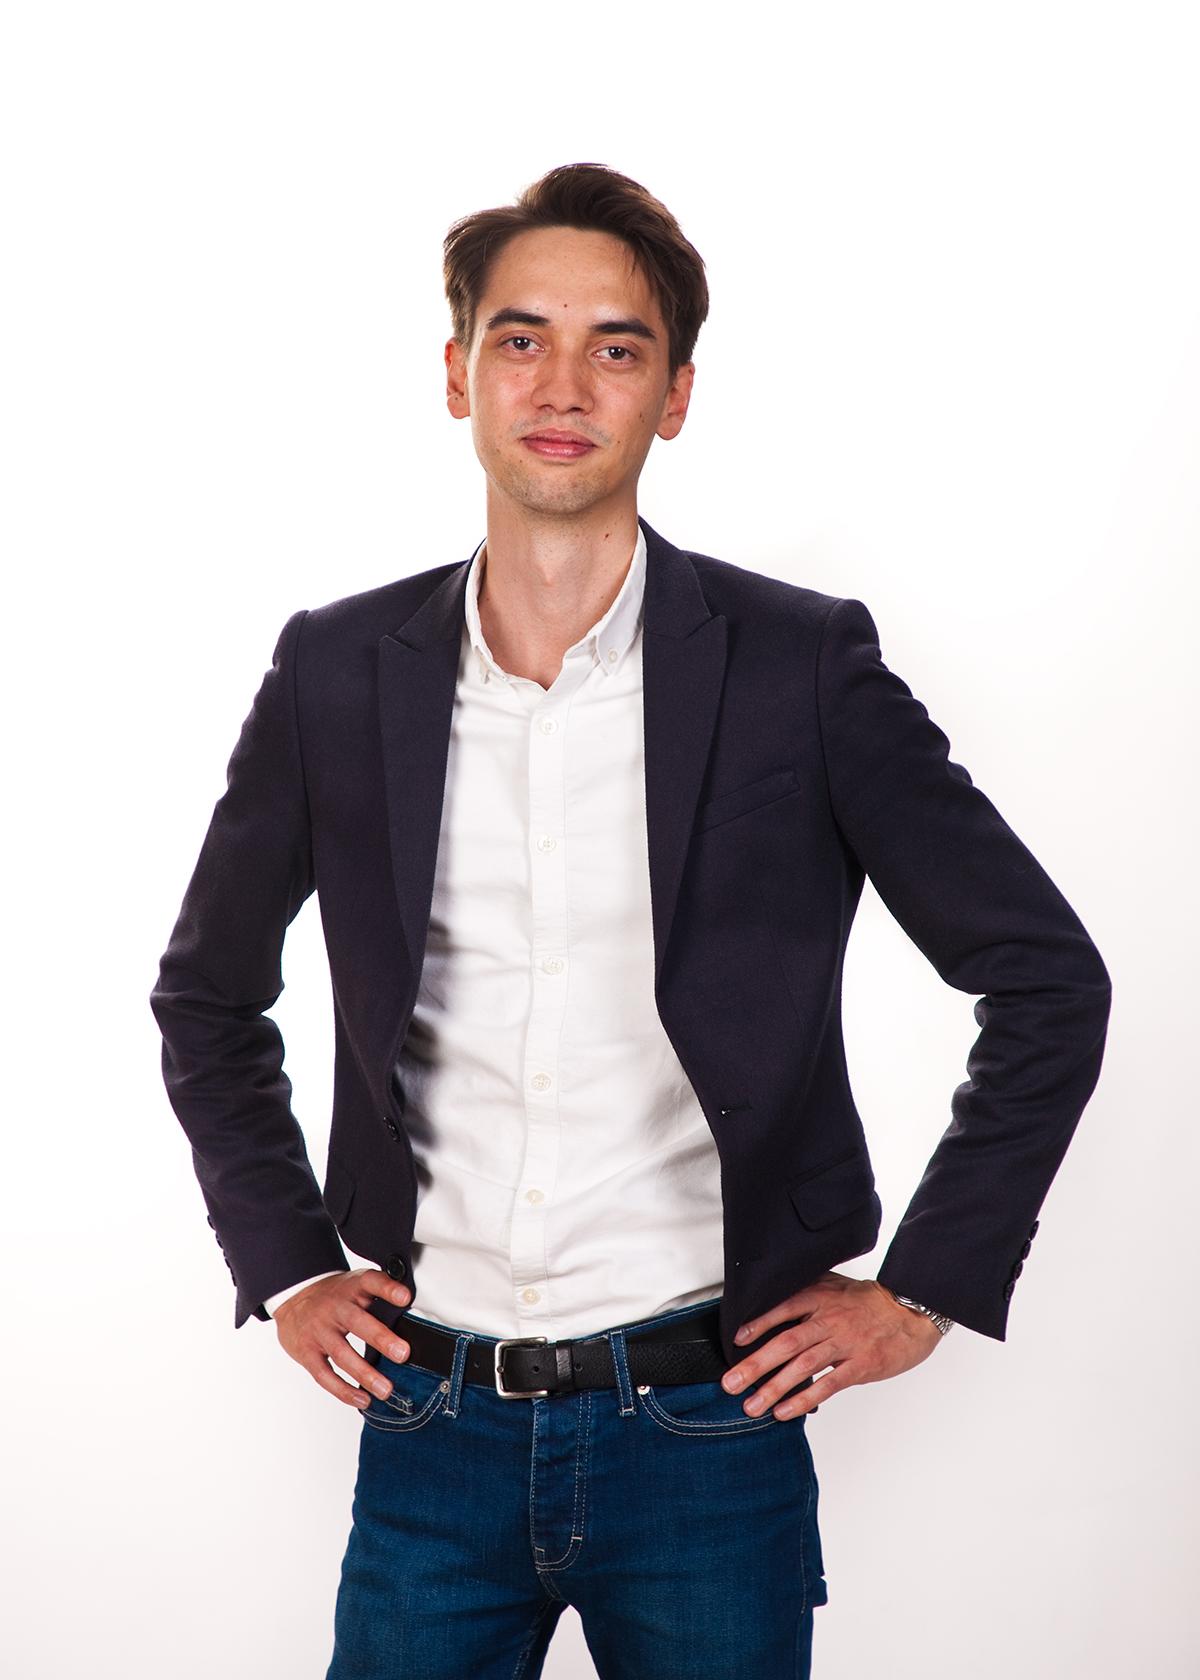 Jonathan Herrmann